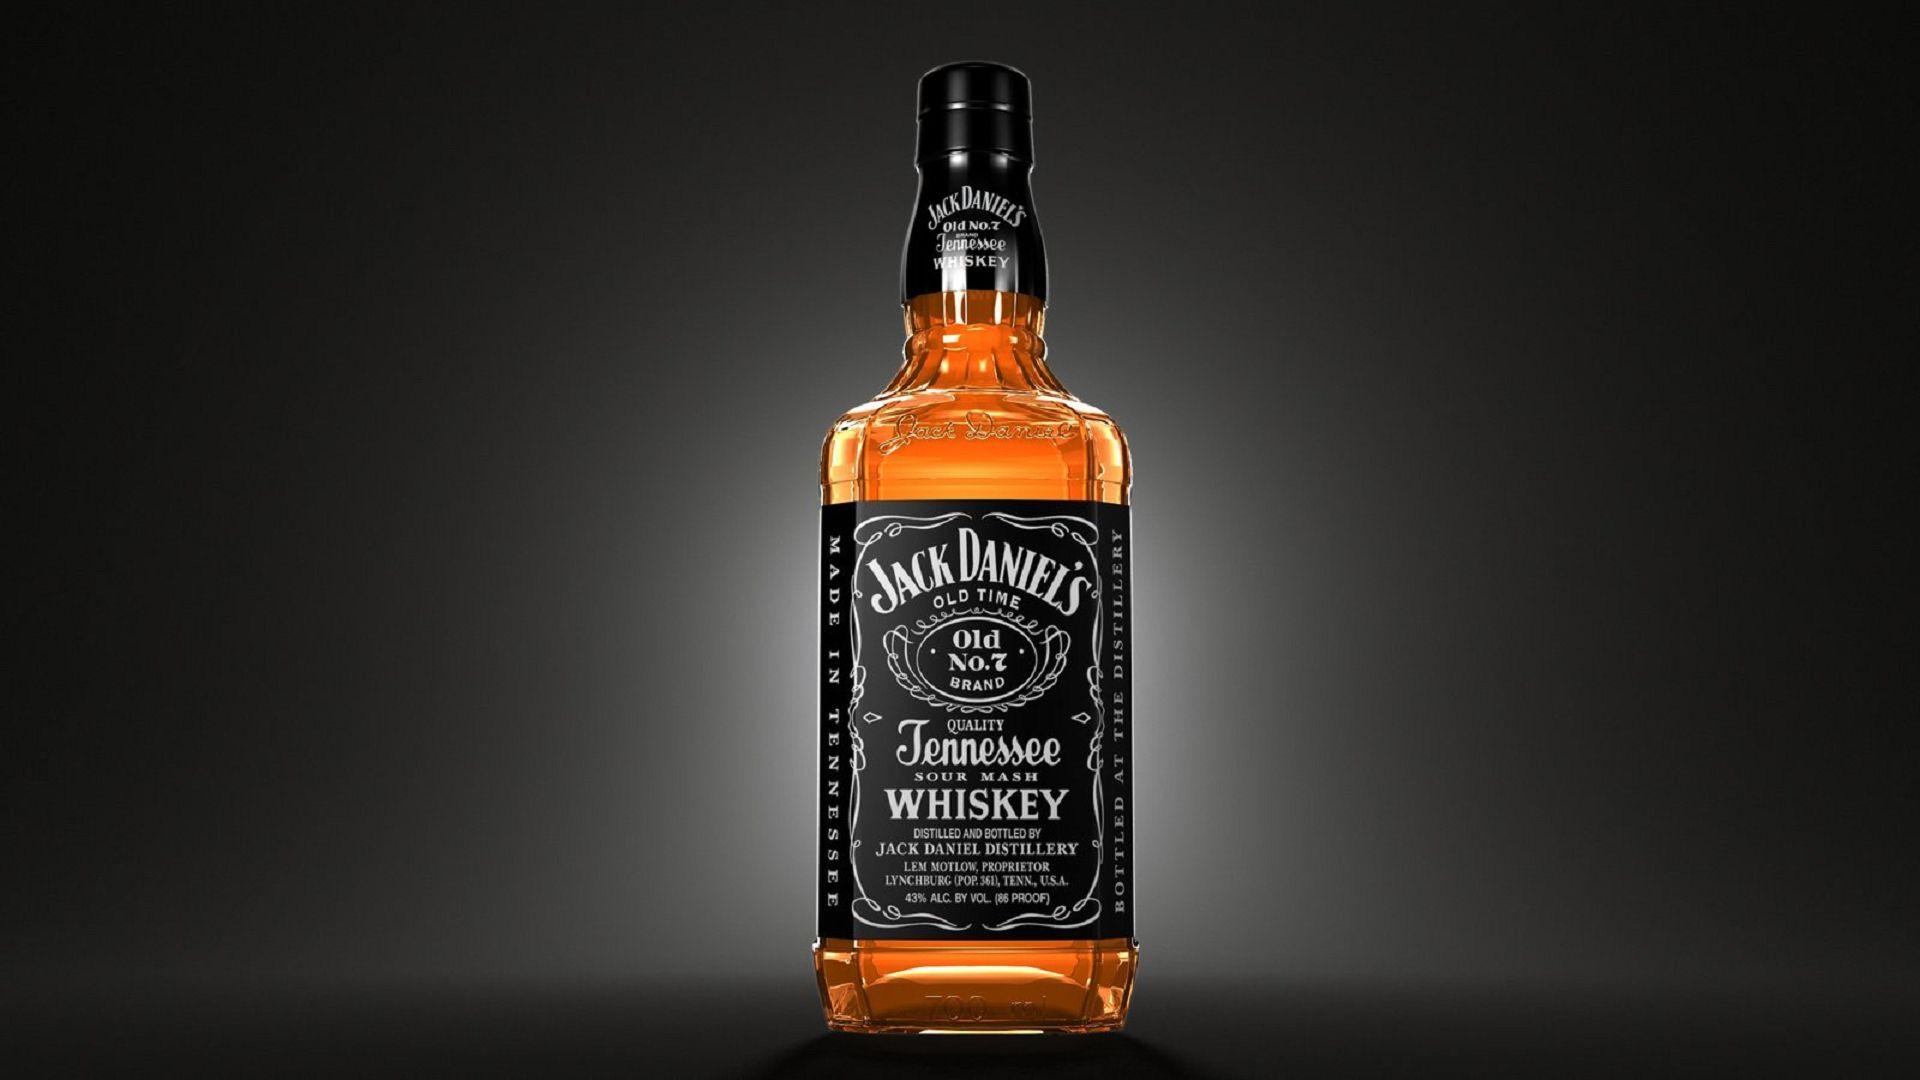 Jack Daniel's Desktop Wallpapers - Wallpaper Cave